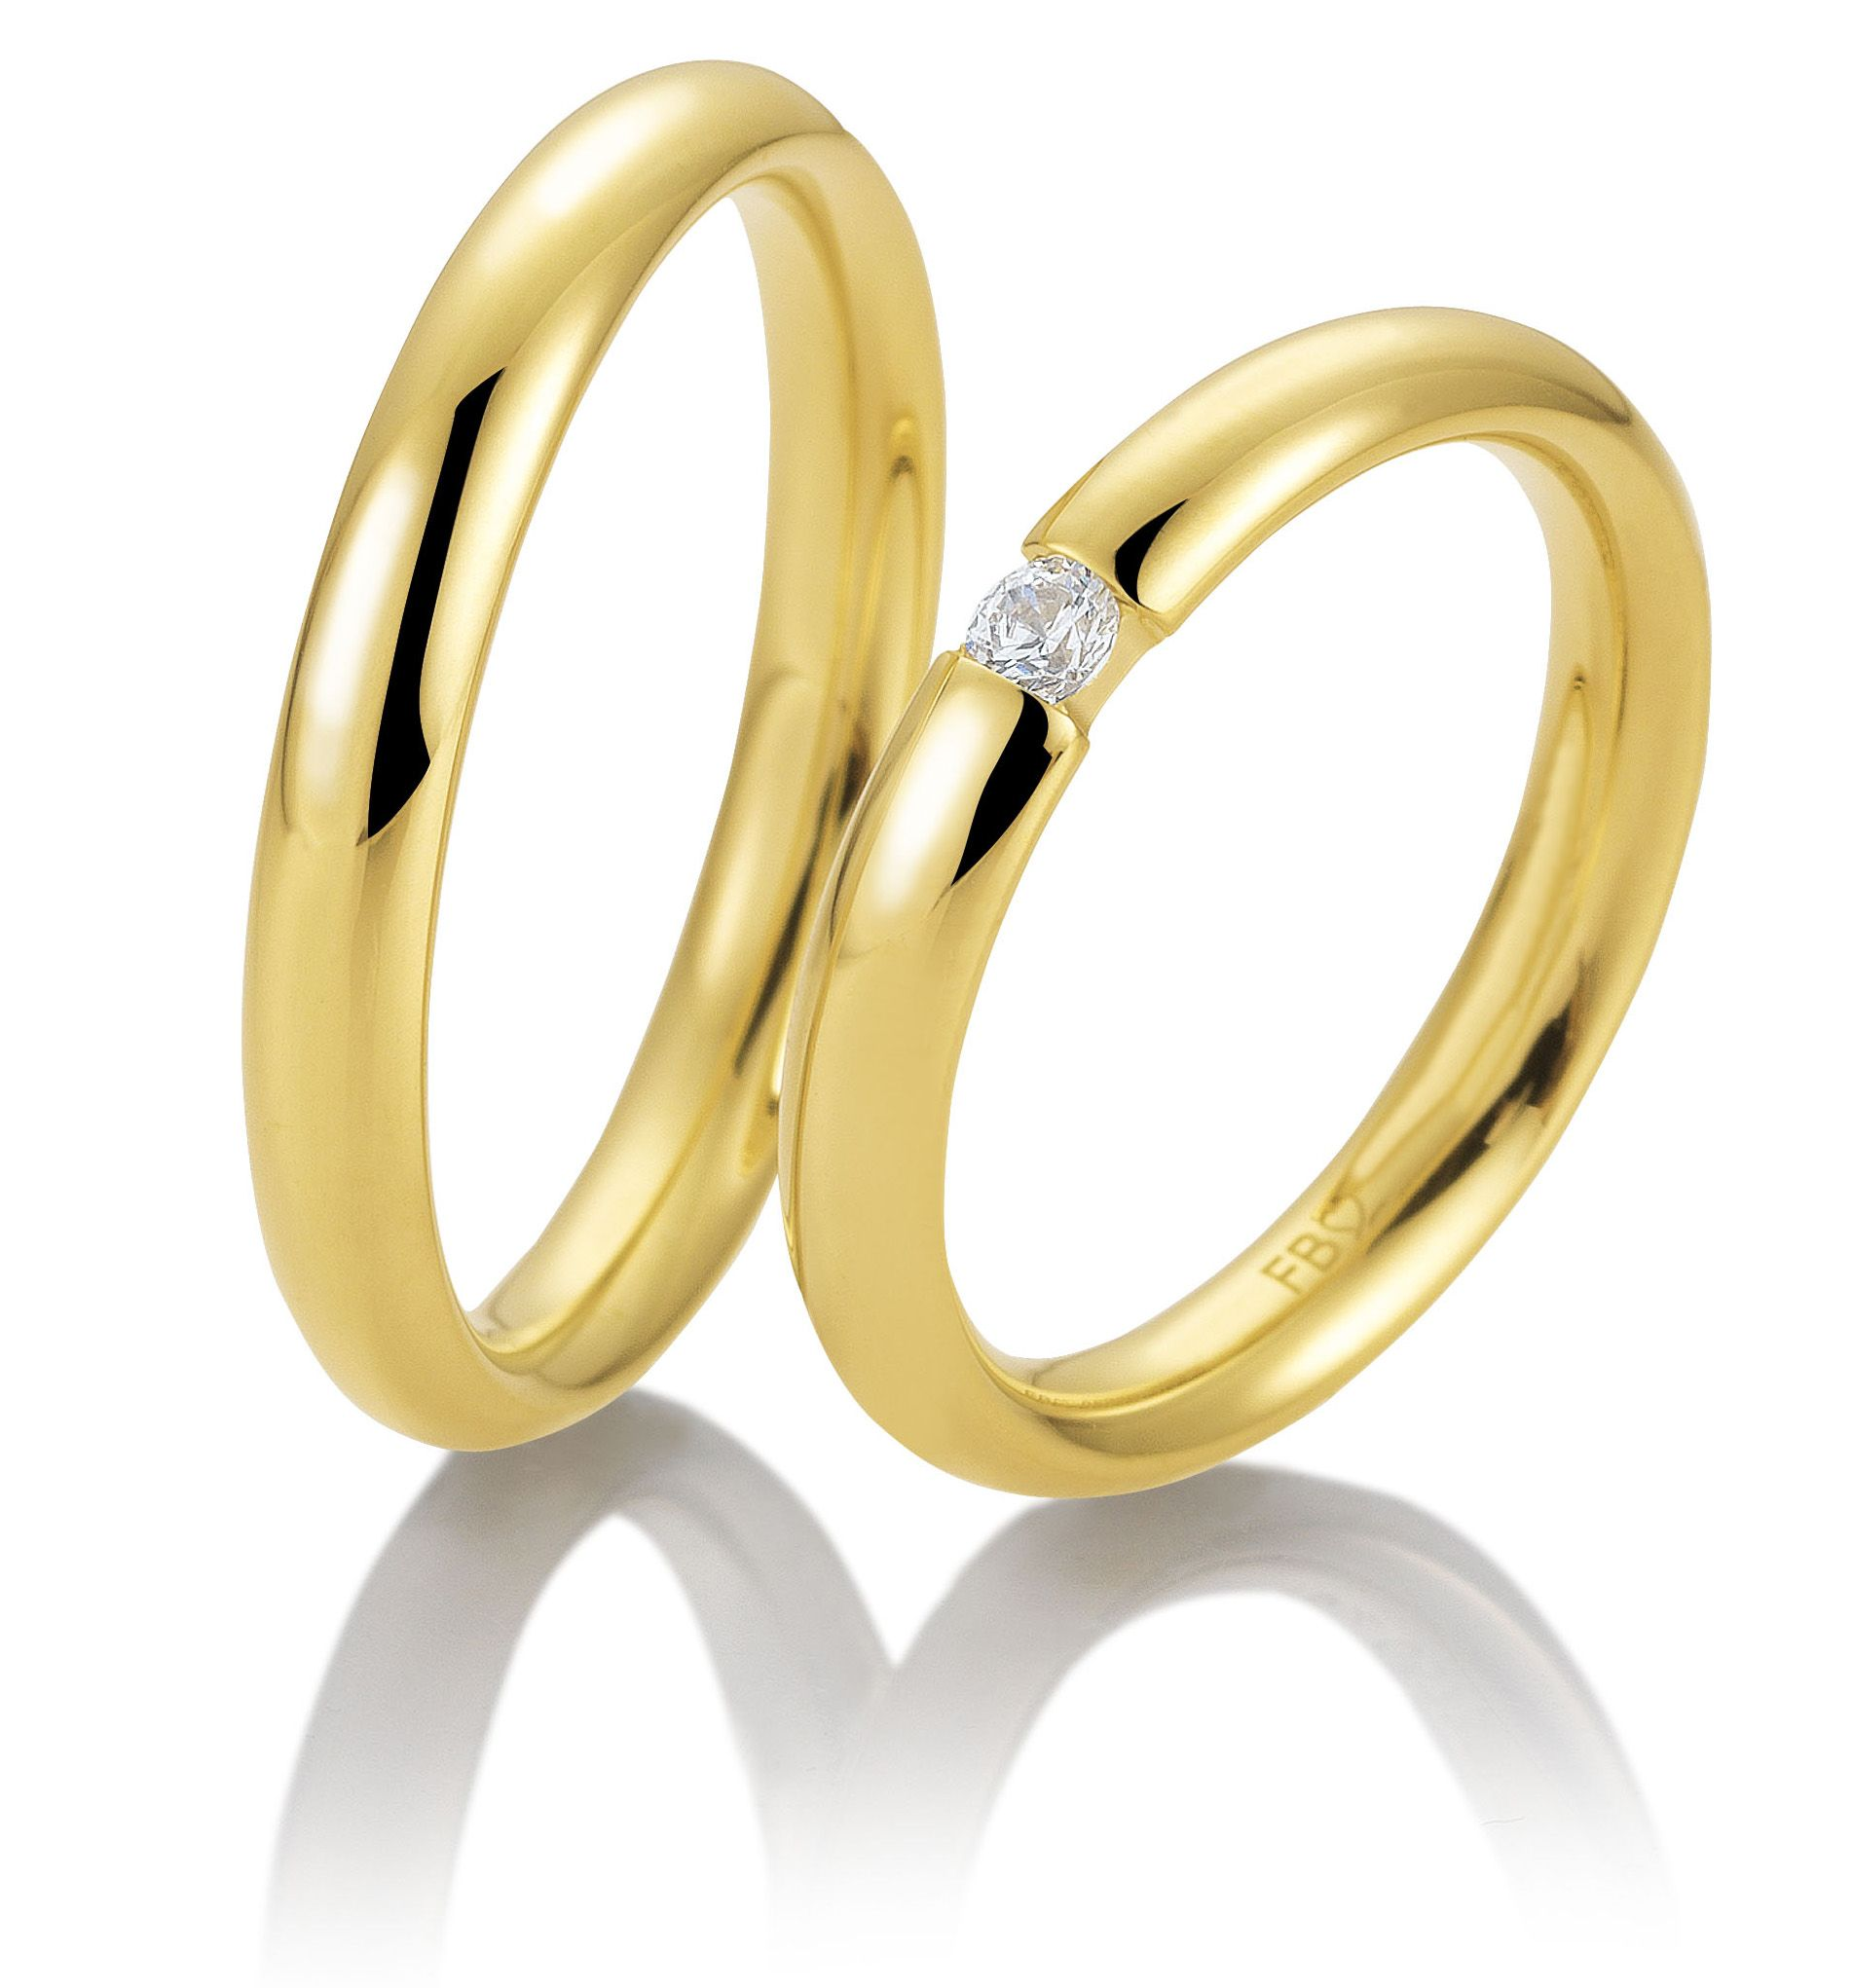 Eheringe Trauringe Breuning Gelbgold 48 585 Gold